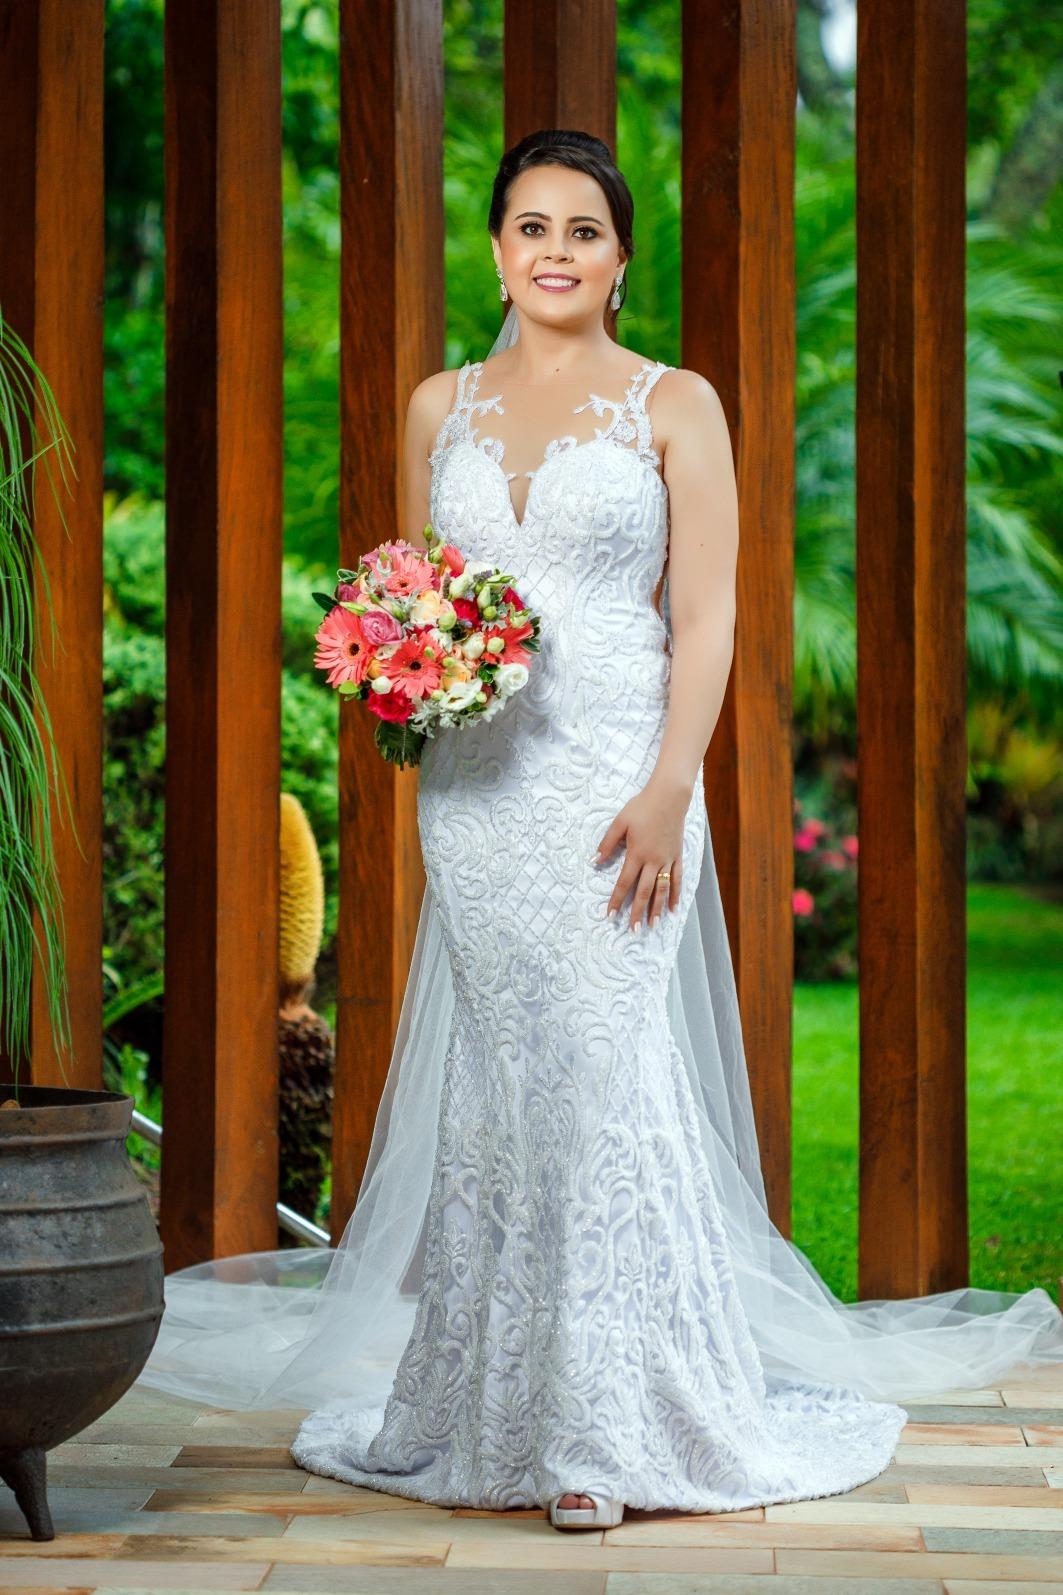 Casamento em Mateus Leme - Weslainne e Rafael - Zephora Alta Costura - Foto Demétrio Laurentys